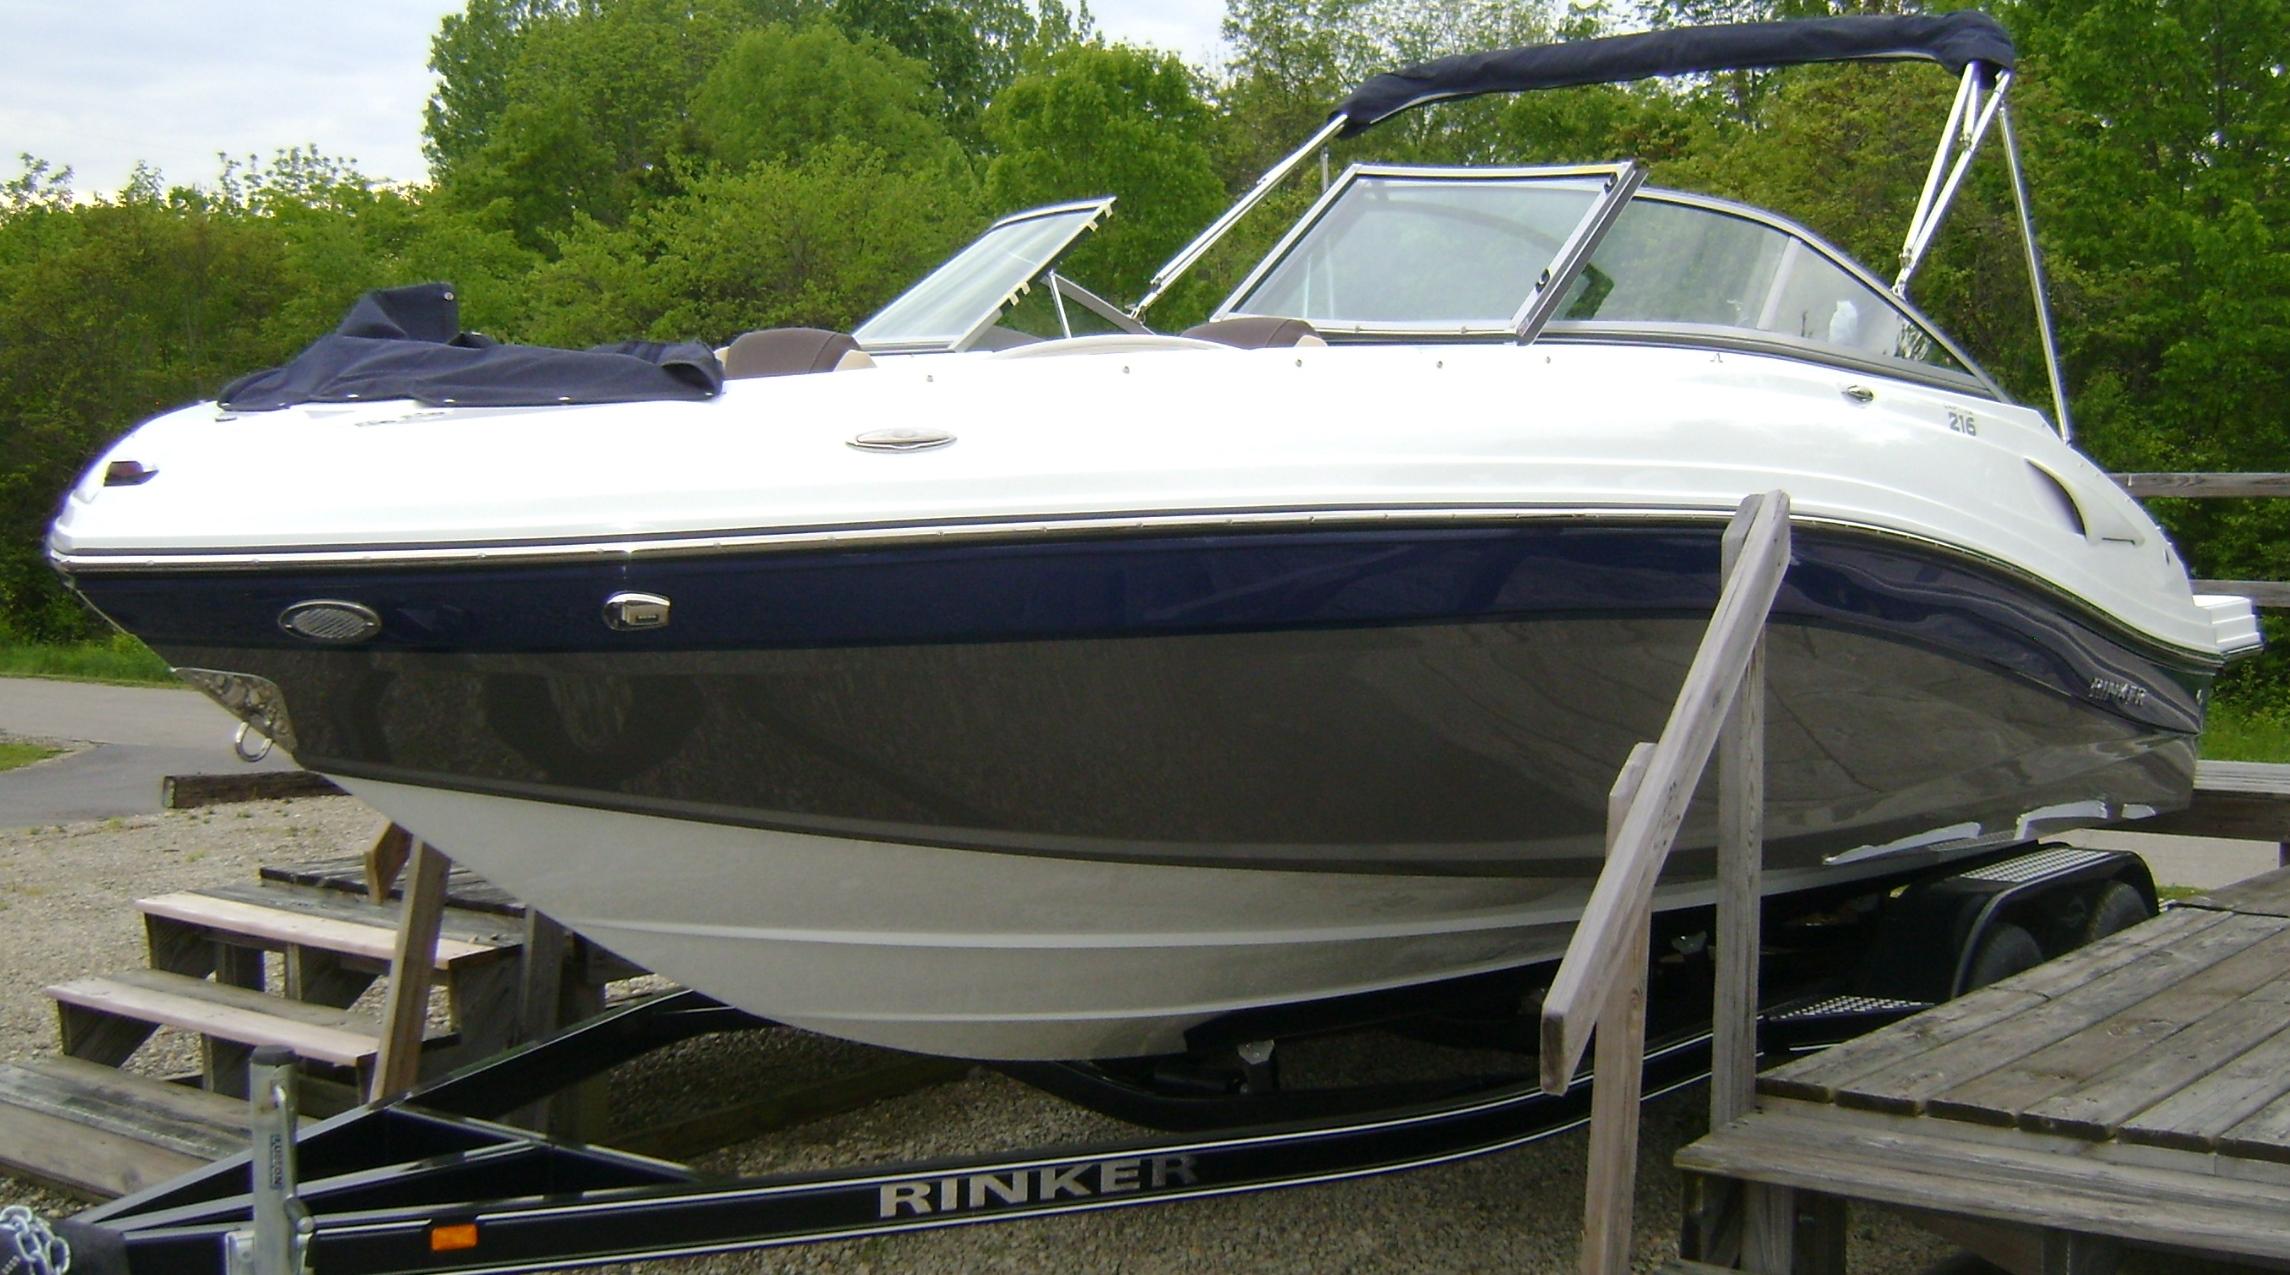 2016 Rinker 216 Captiva Kent S Harbor Inc